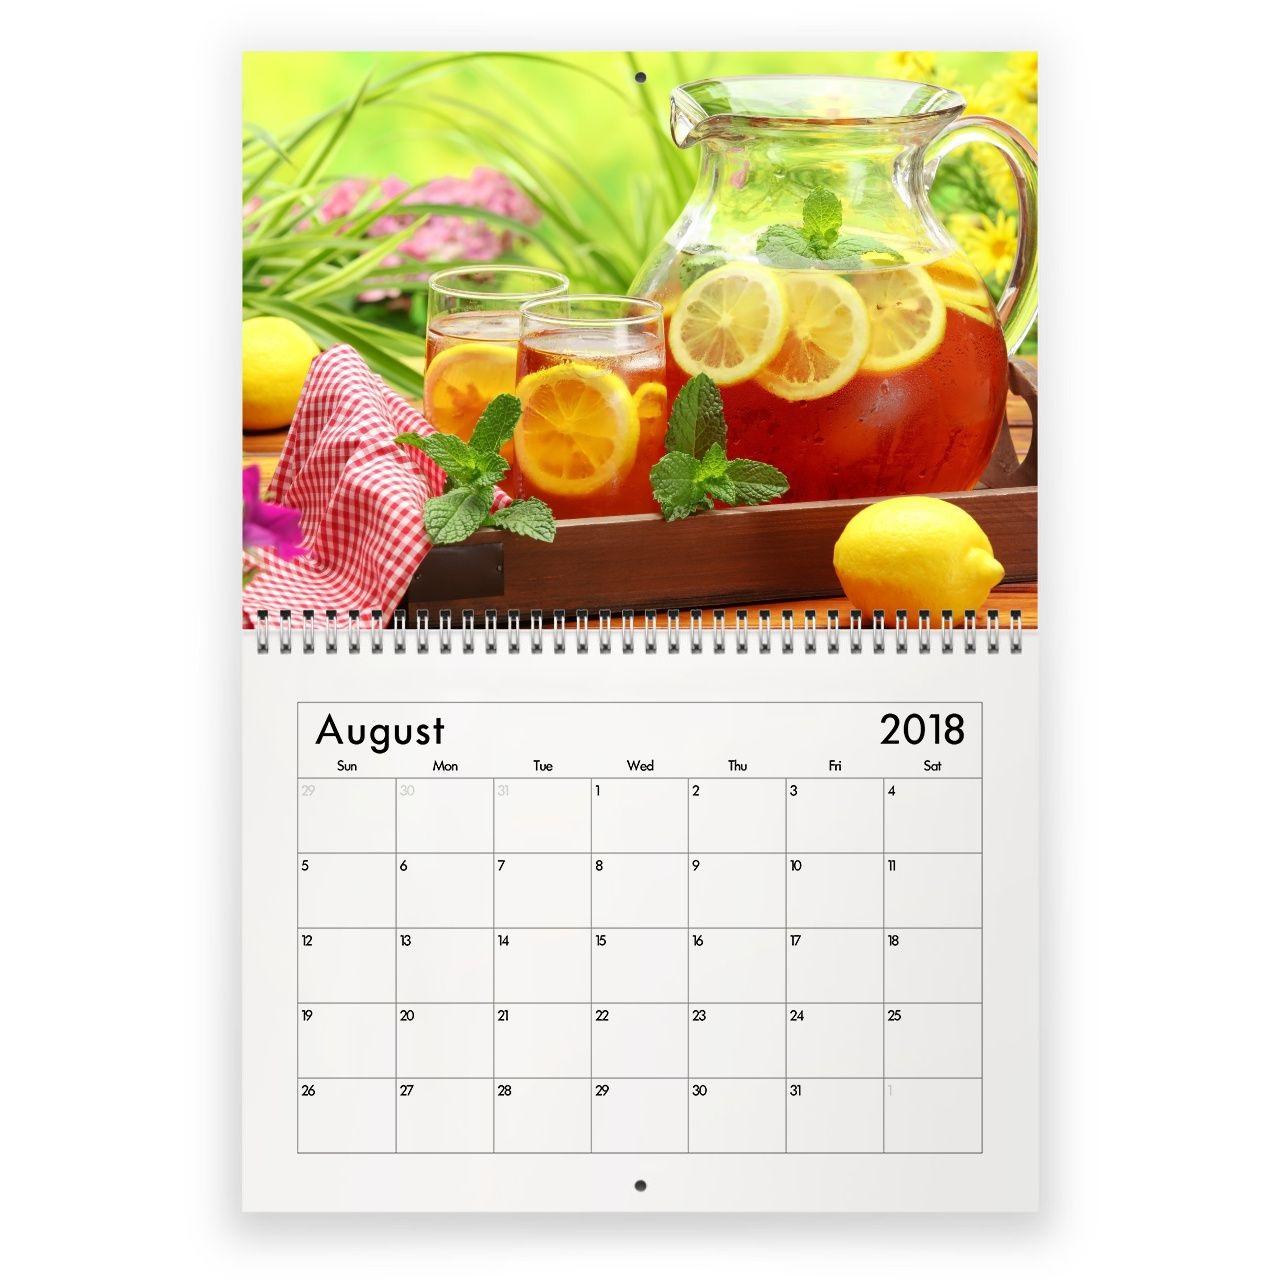 Amazing August 2018 Wall Calendar